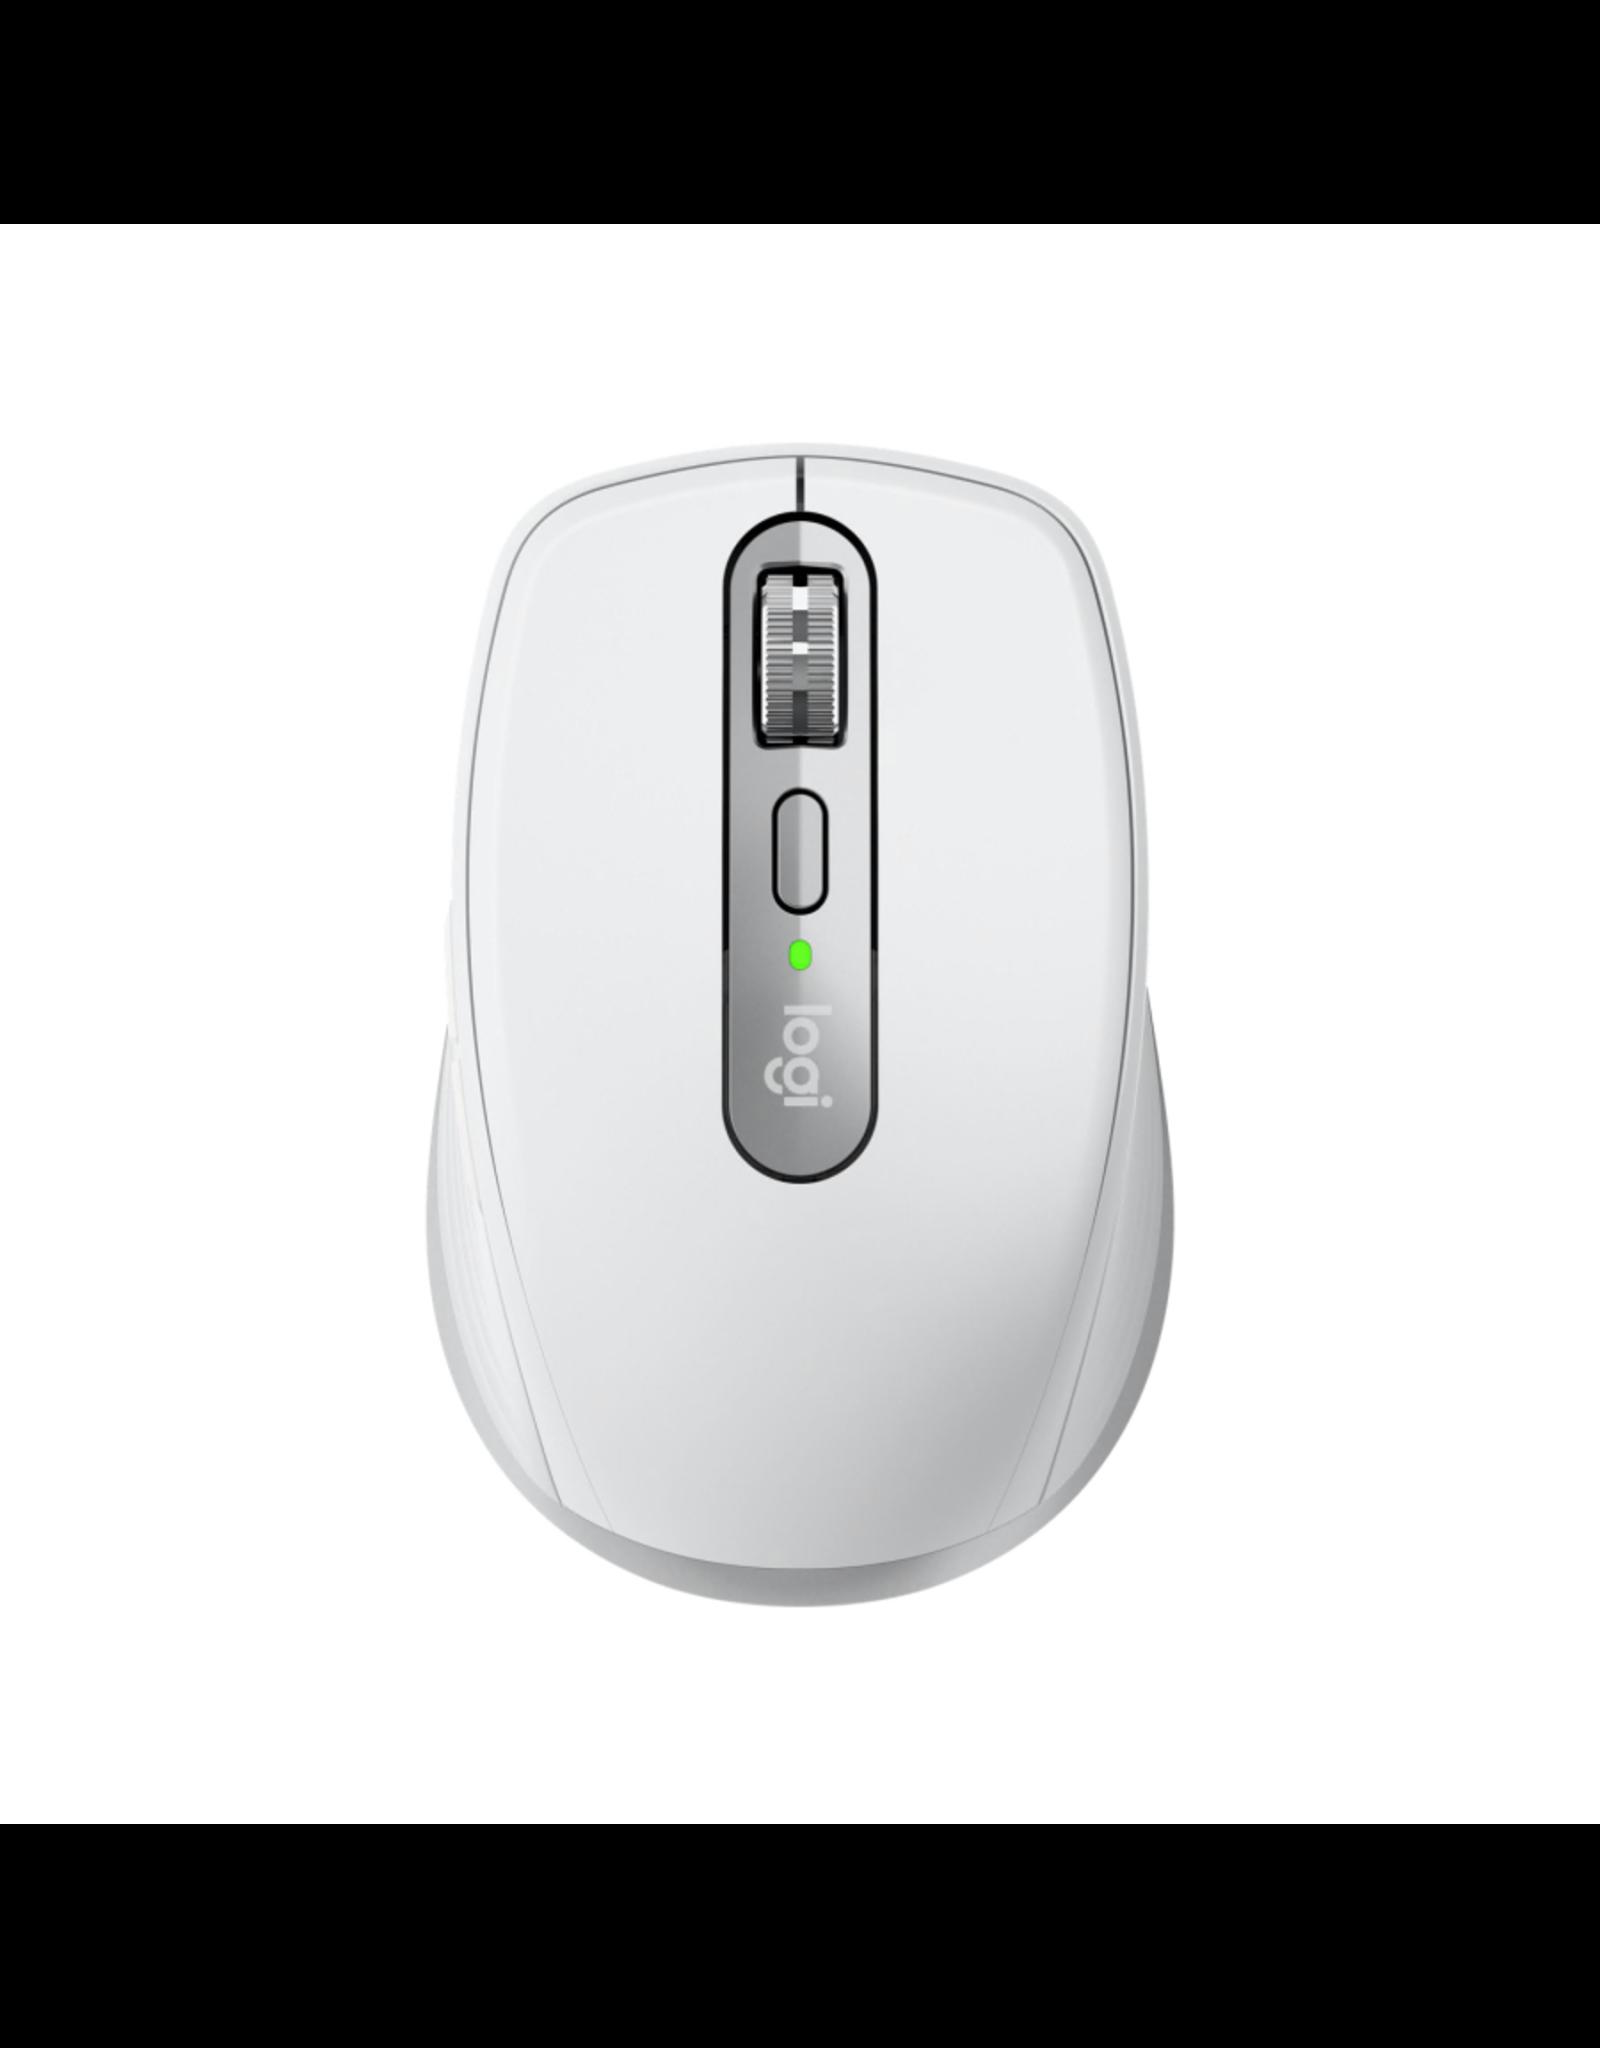 Logitech Logitech MX Anywhere 3 for Mac Bluetooth Wireless Mouse